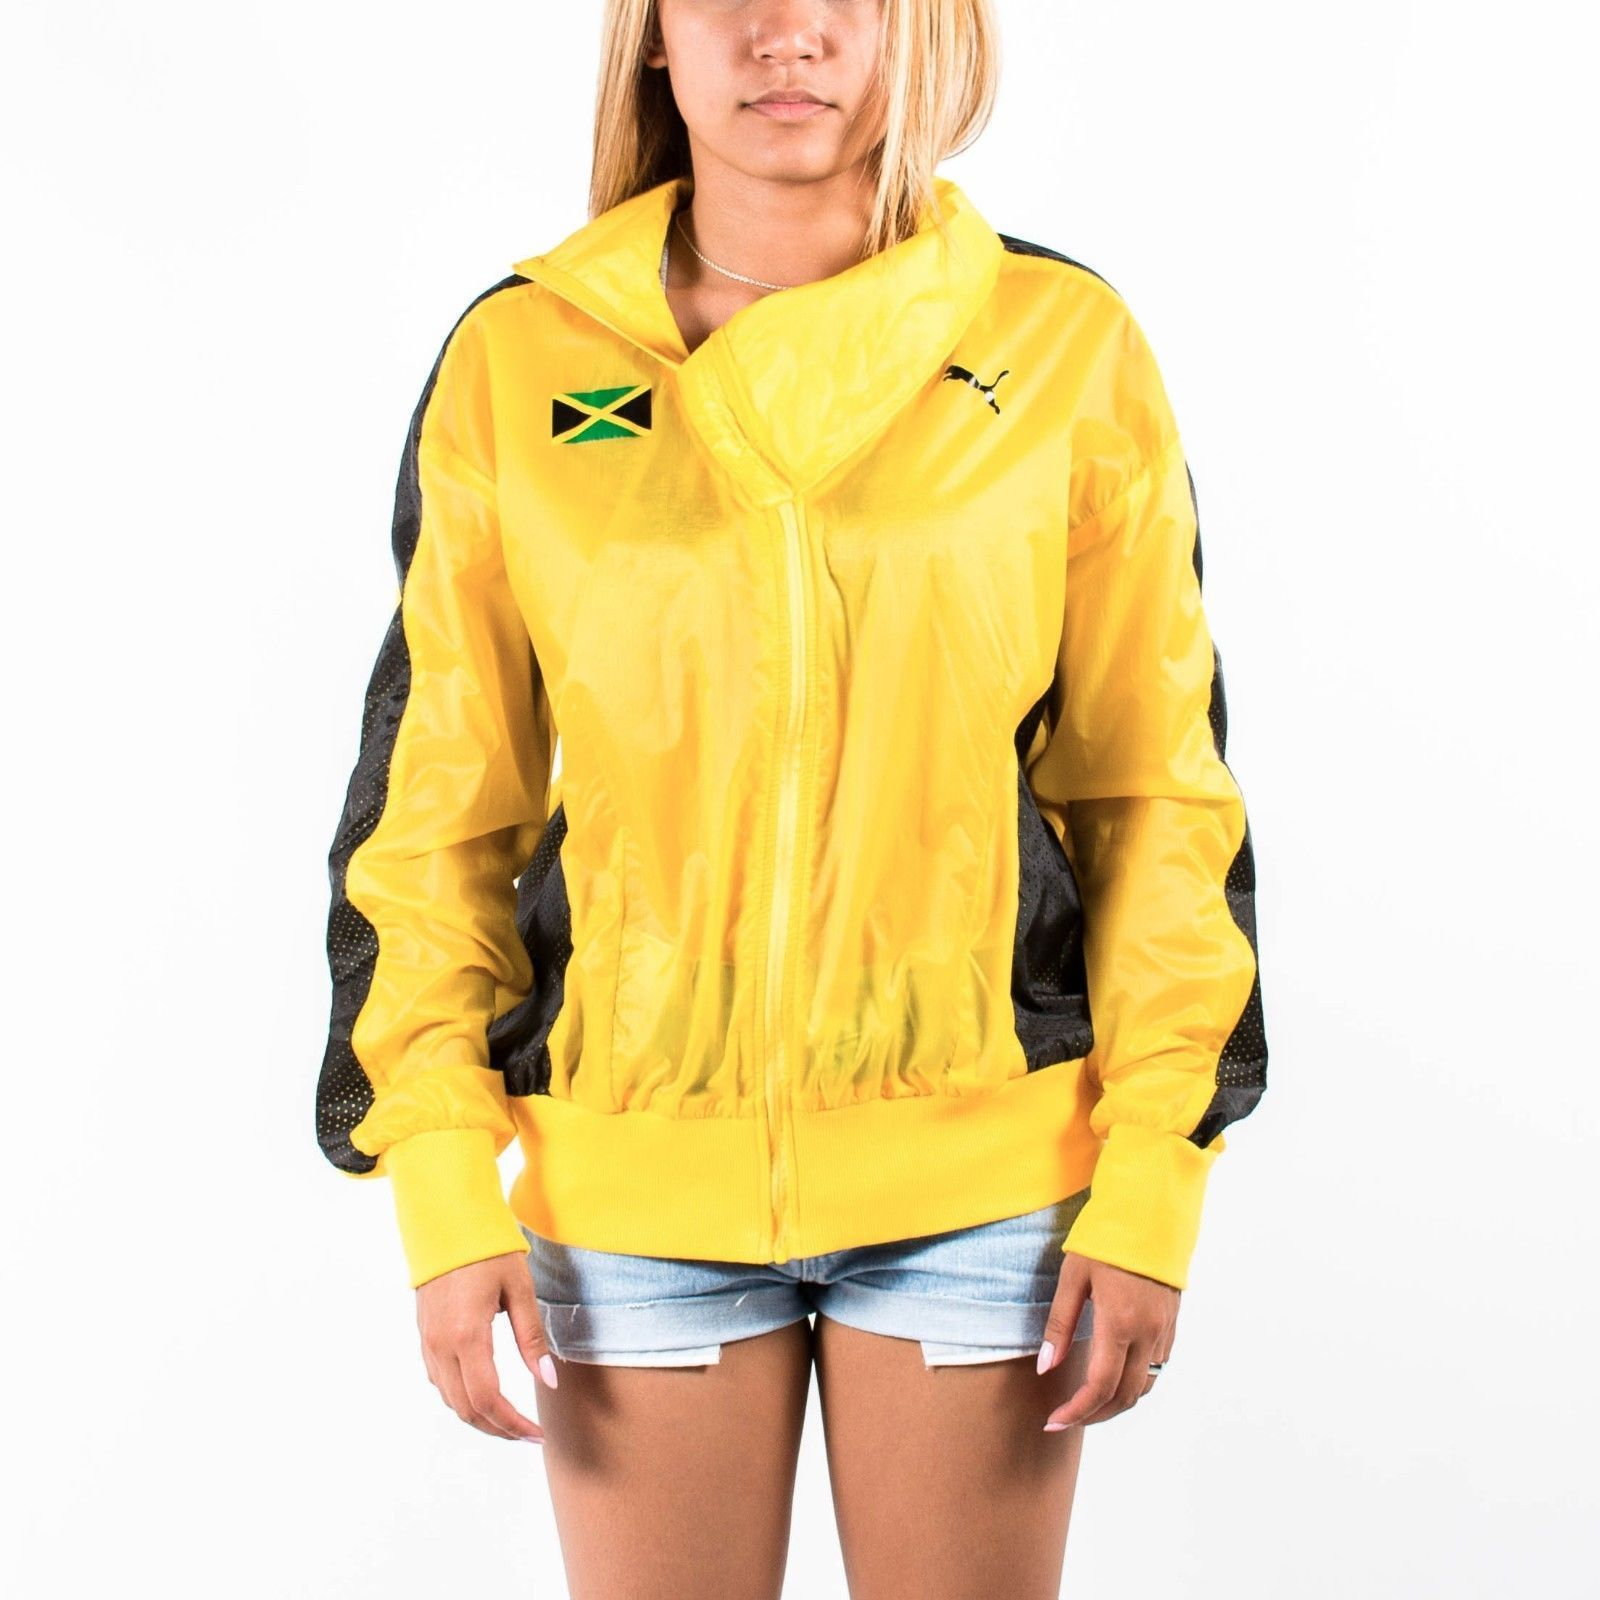 Puma Womens Riddim Podium Jacket Spectra Yellow 508933 01 Jamaica ...